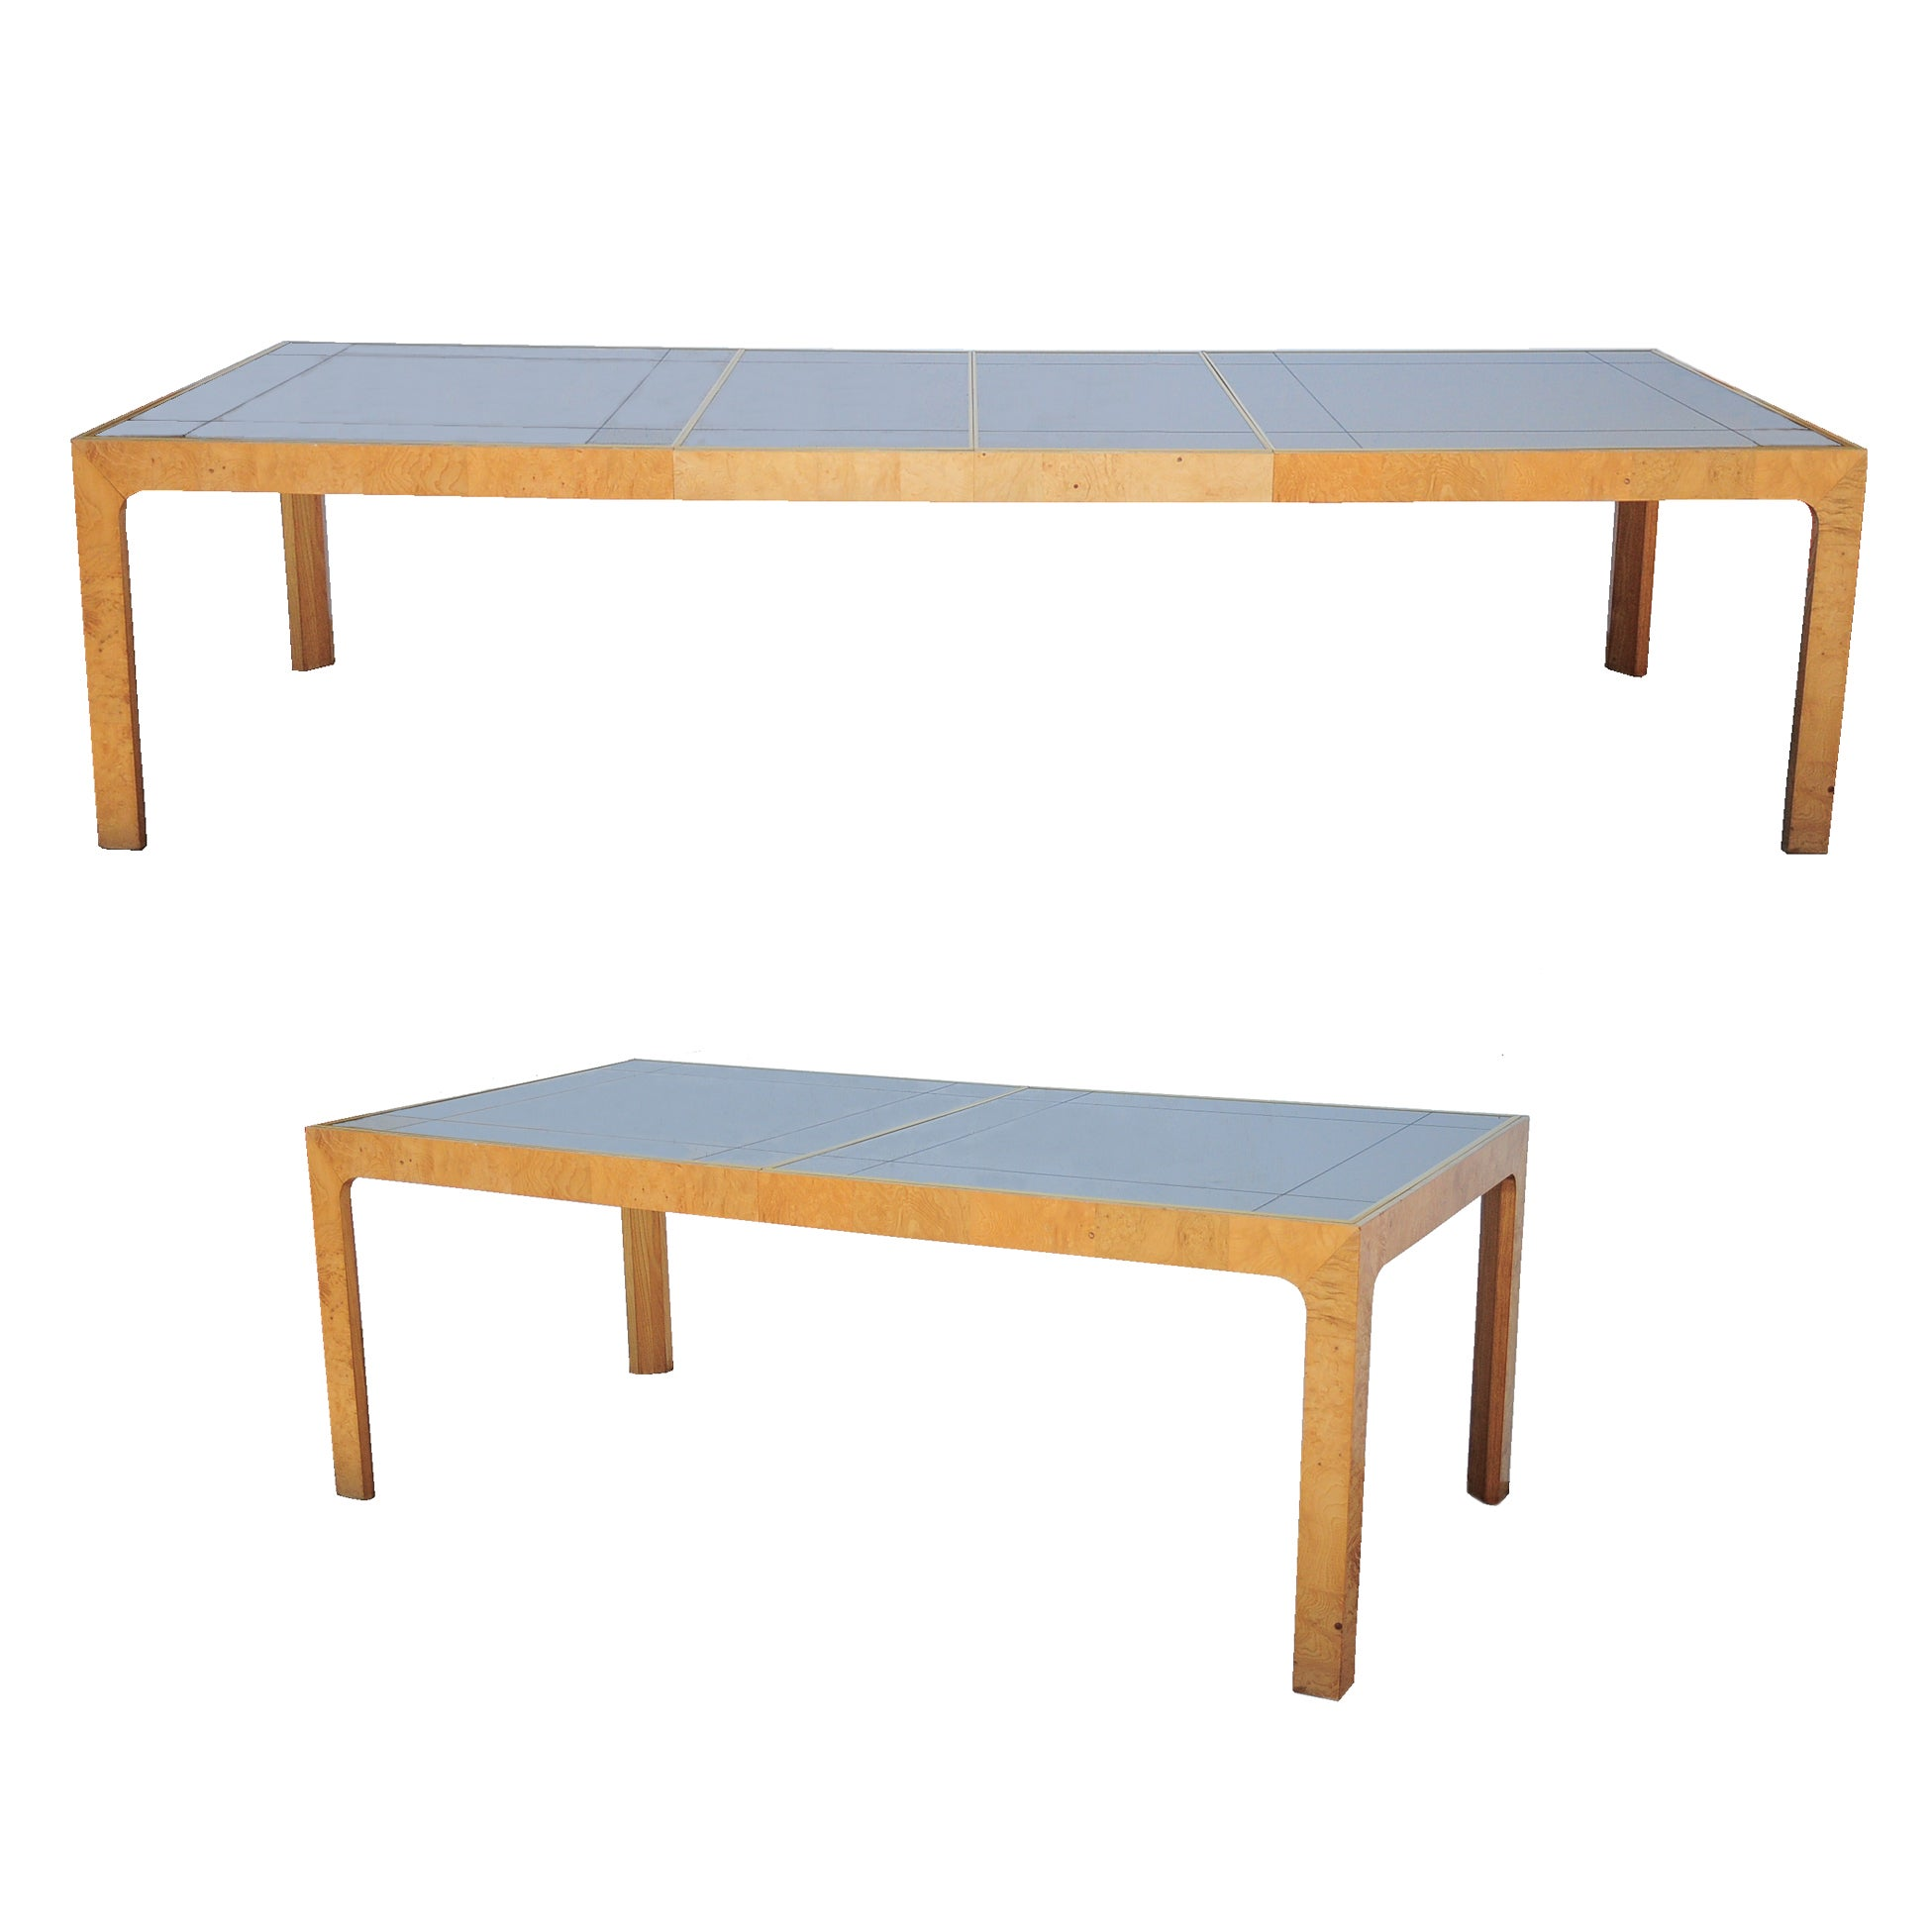 Milo Baughman Style Henredon Scene Two Burl Wood Mirror Dining Table w/ 2 Leaves